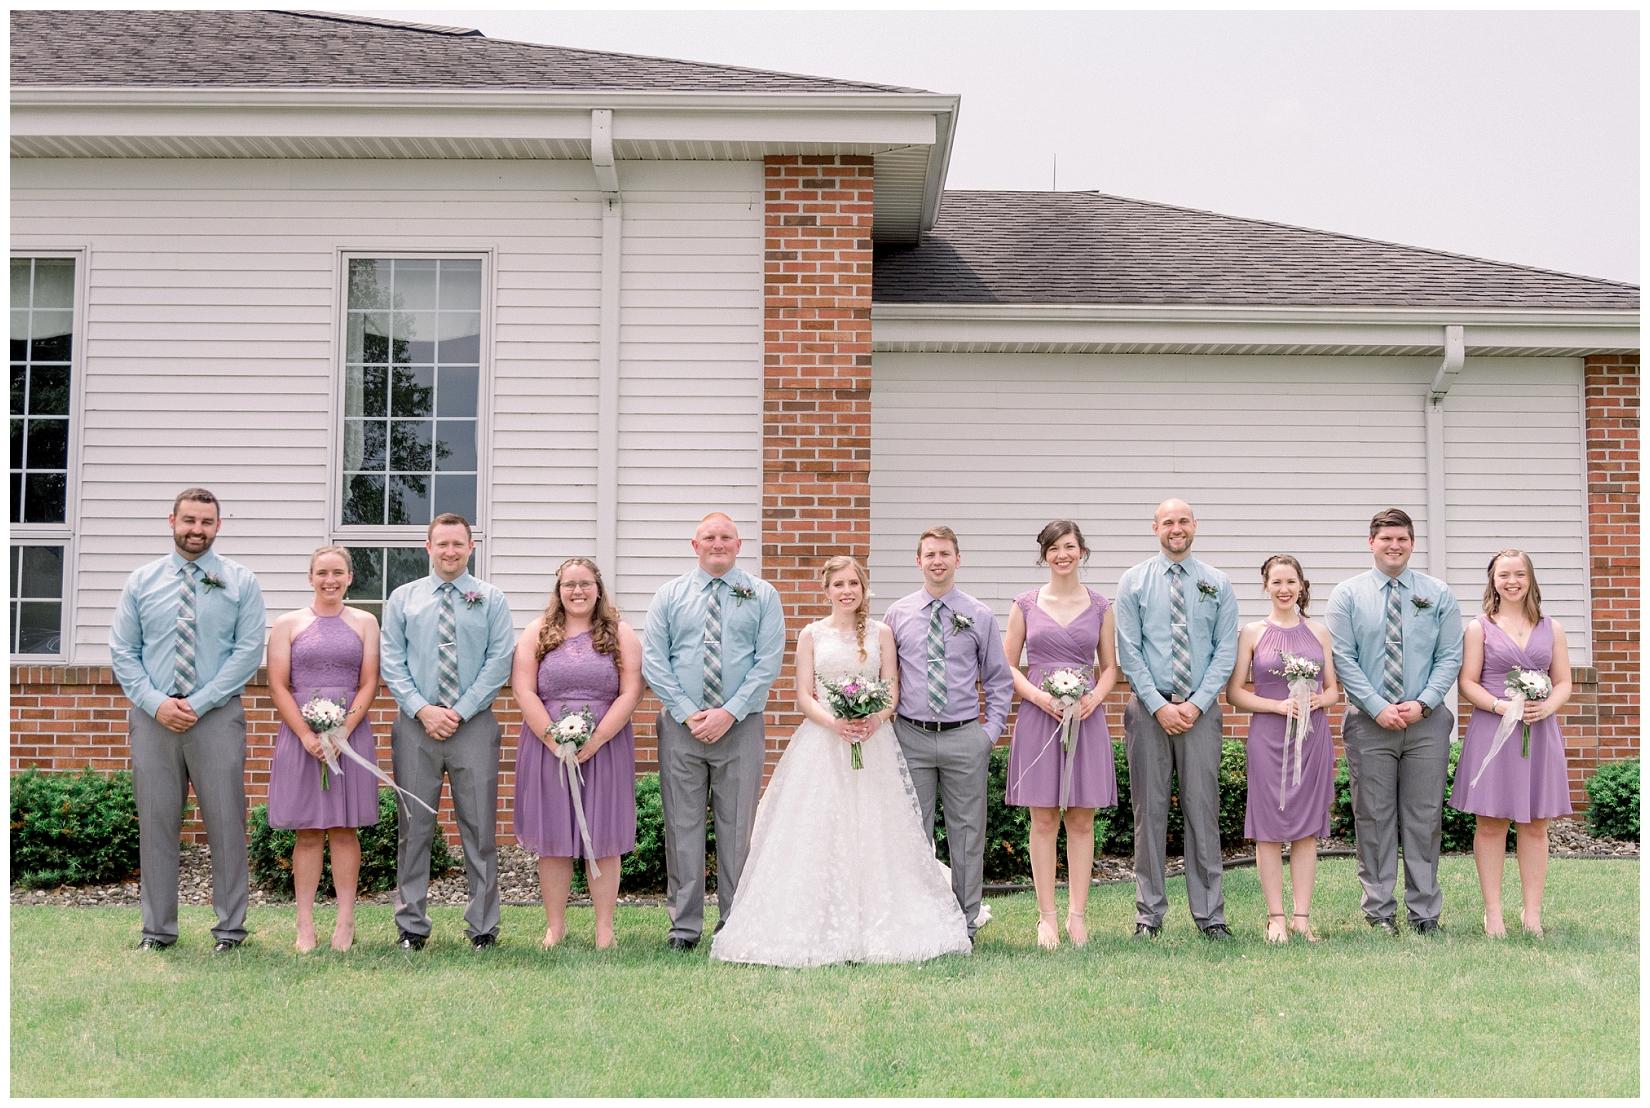 cat-alkire-wedding-photographer-indiana-chicago-indianapolis-fort-wayne_1299.jpg